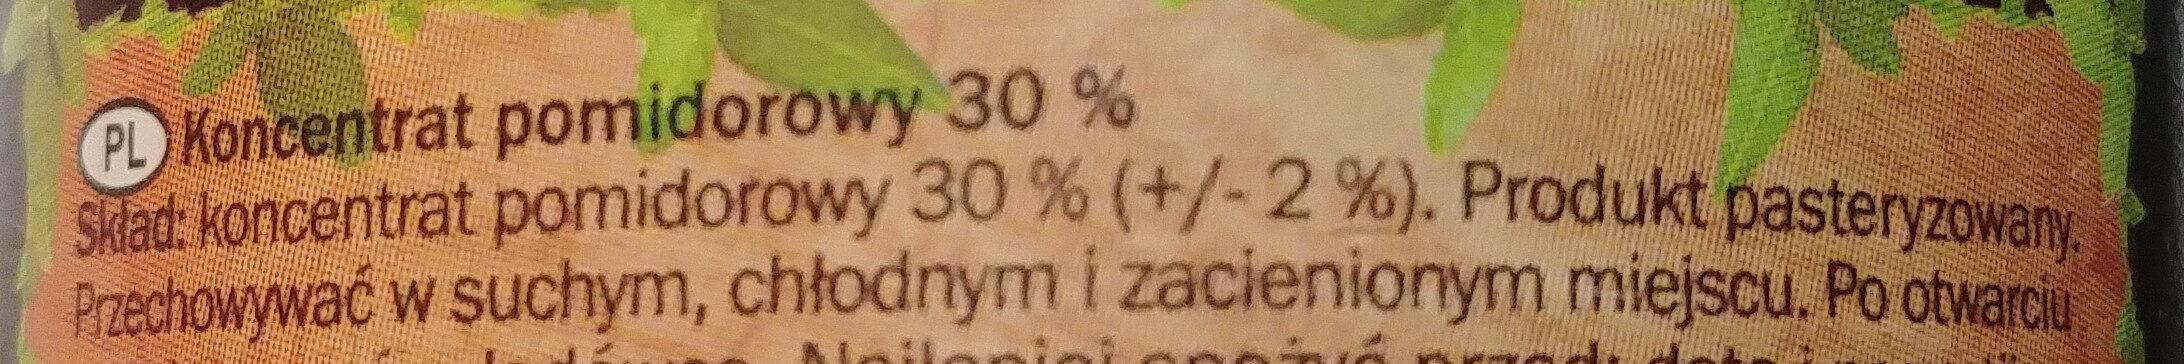 Koncentrat pomidorowy 30% - Ingrediënten